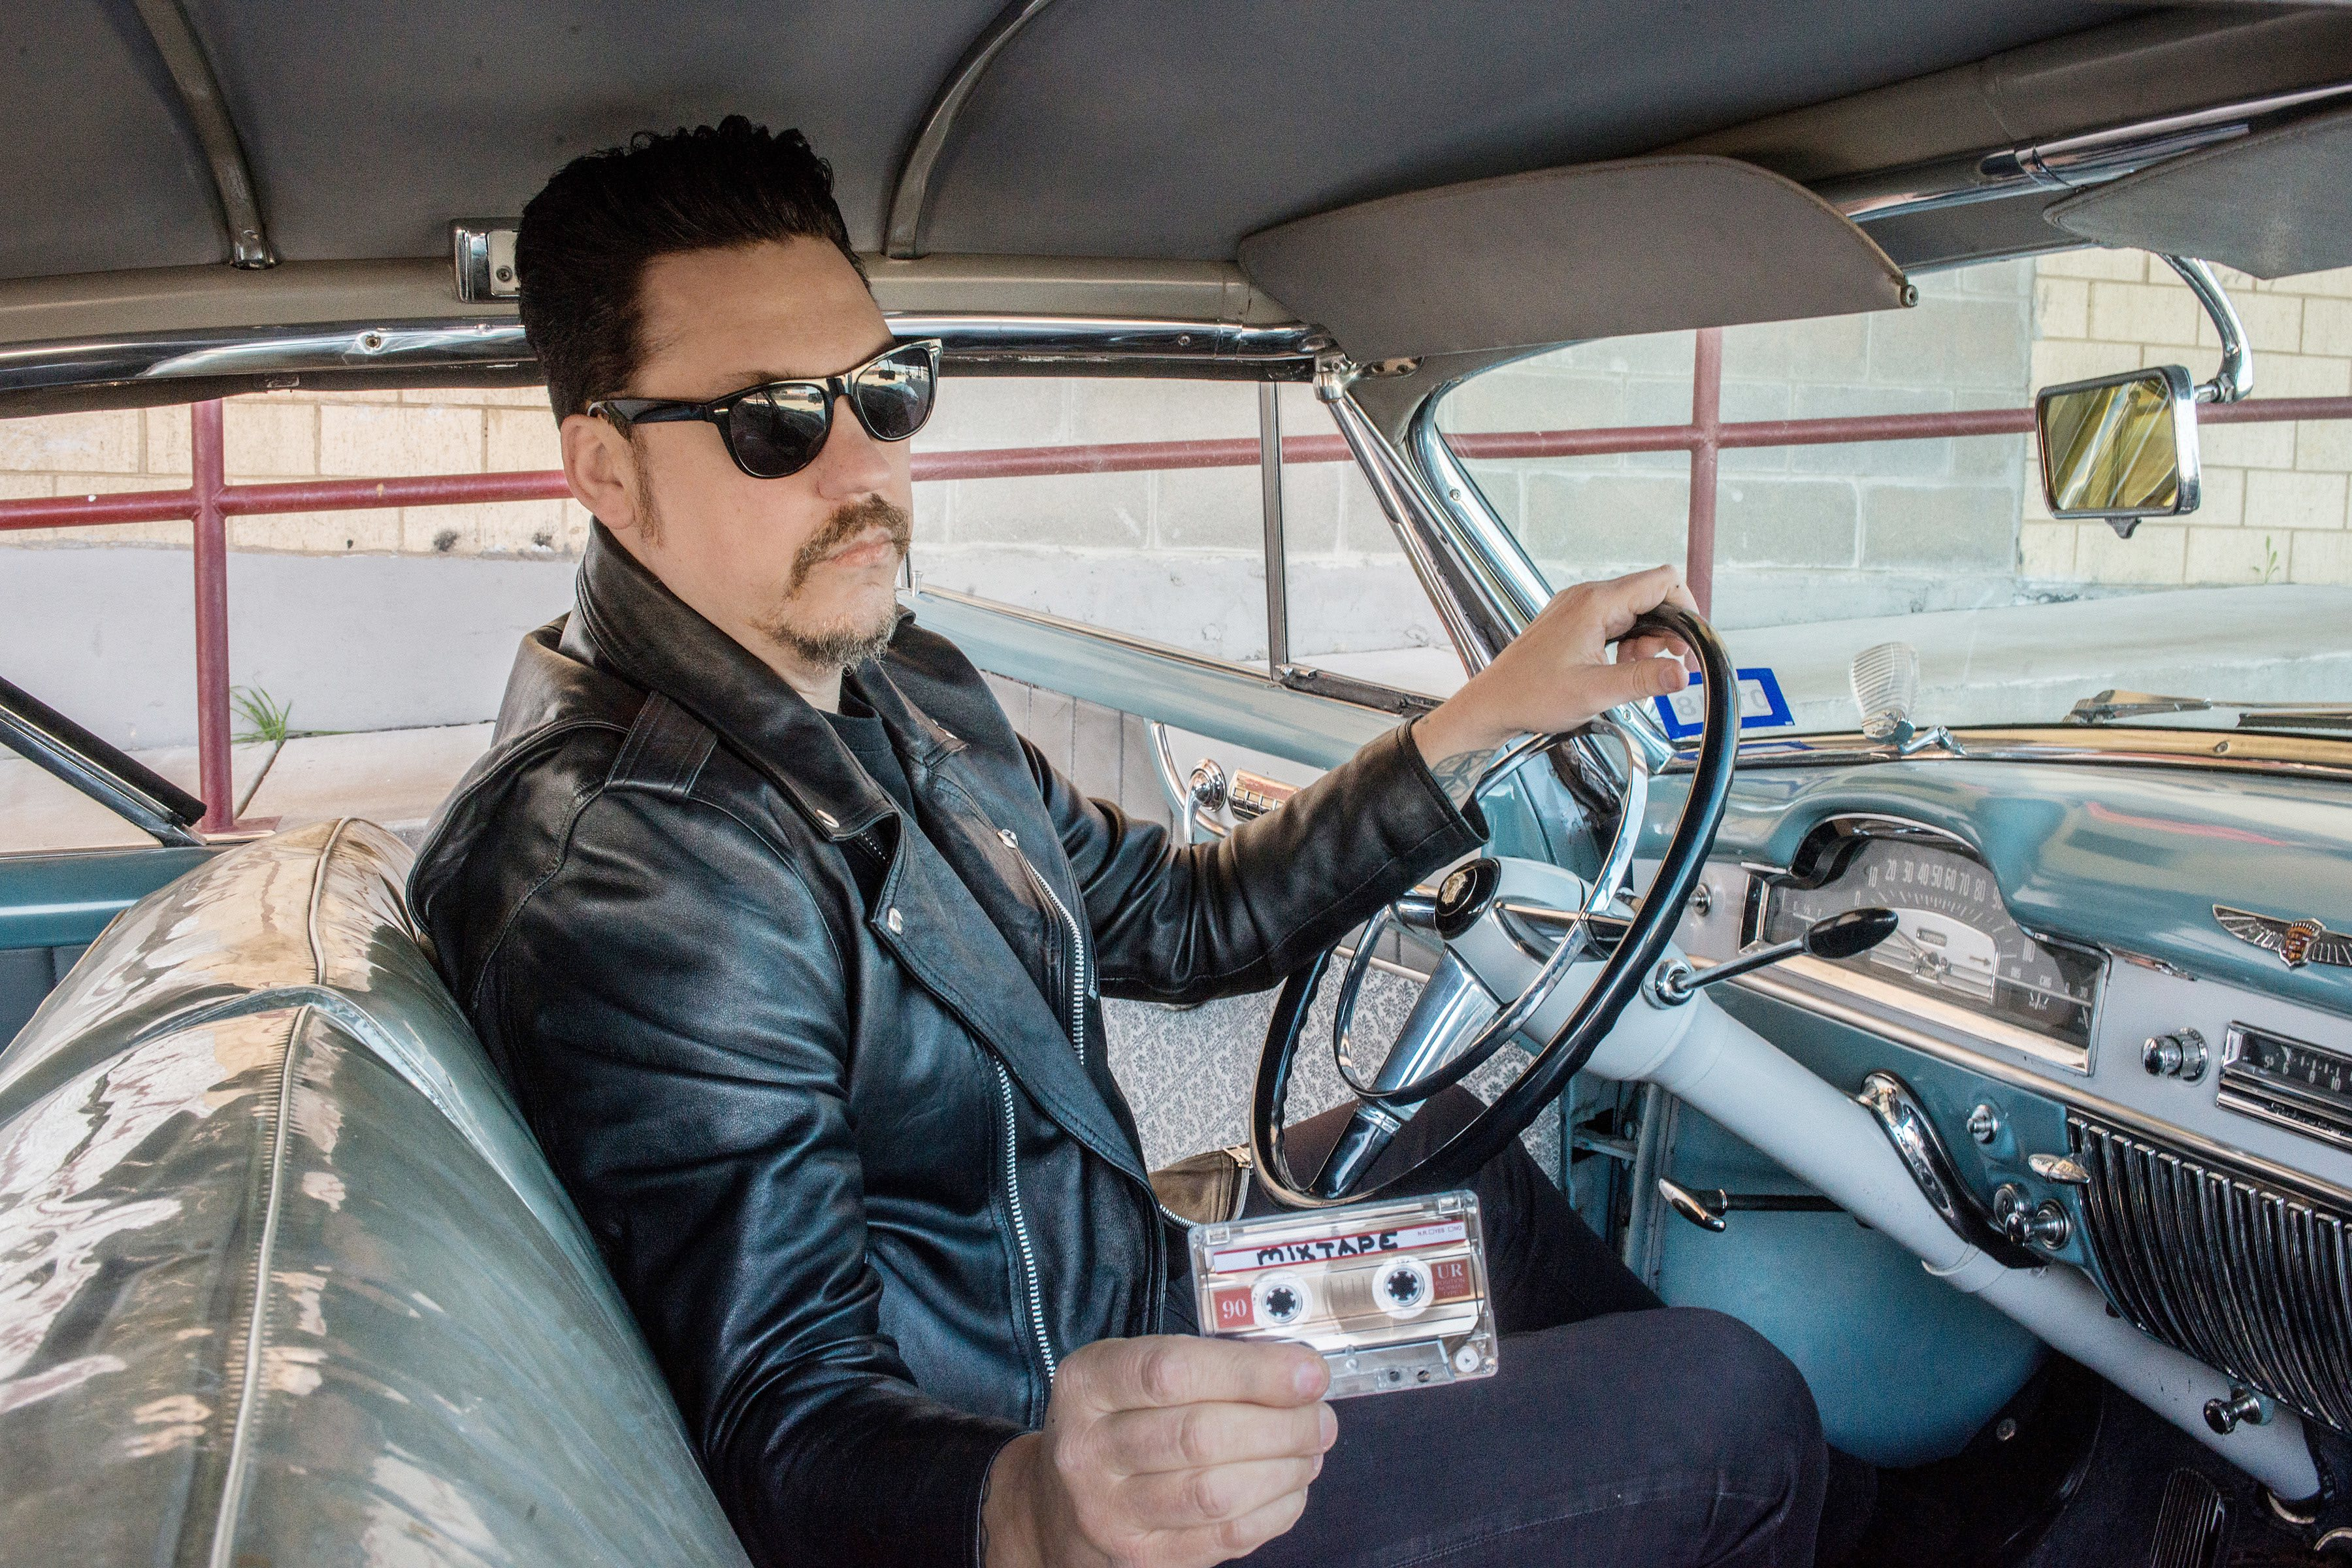 Jesse Dayton Interprets the Clash, Springsteen on New 'Mixtape' Album